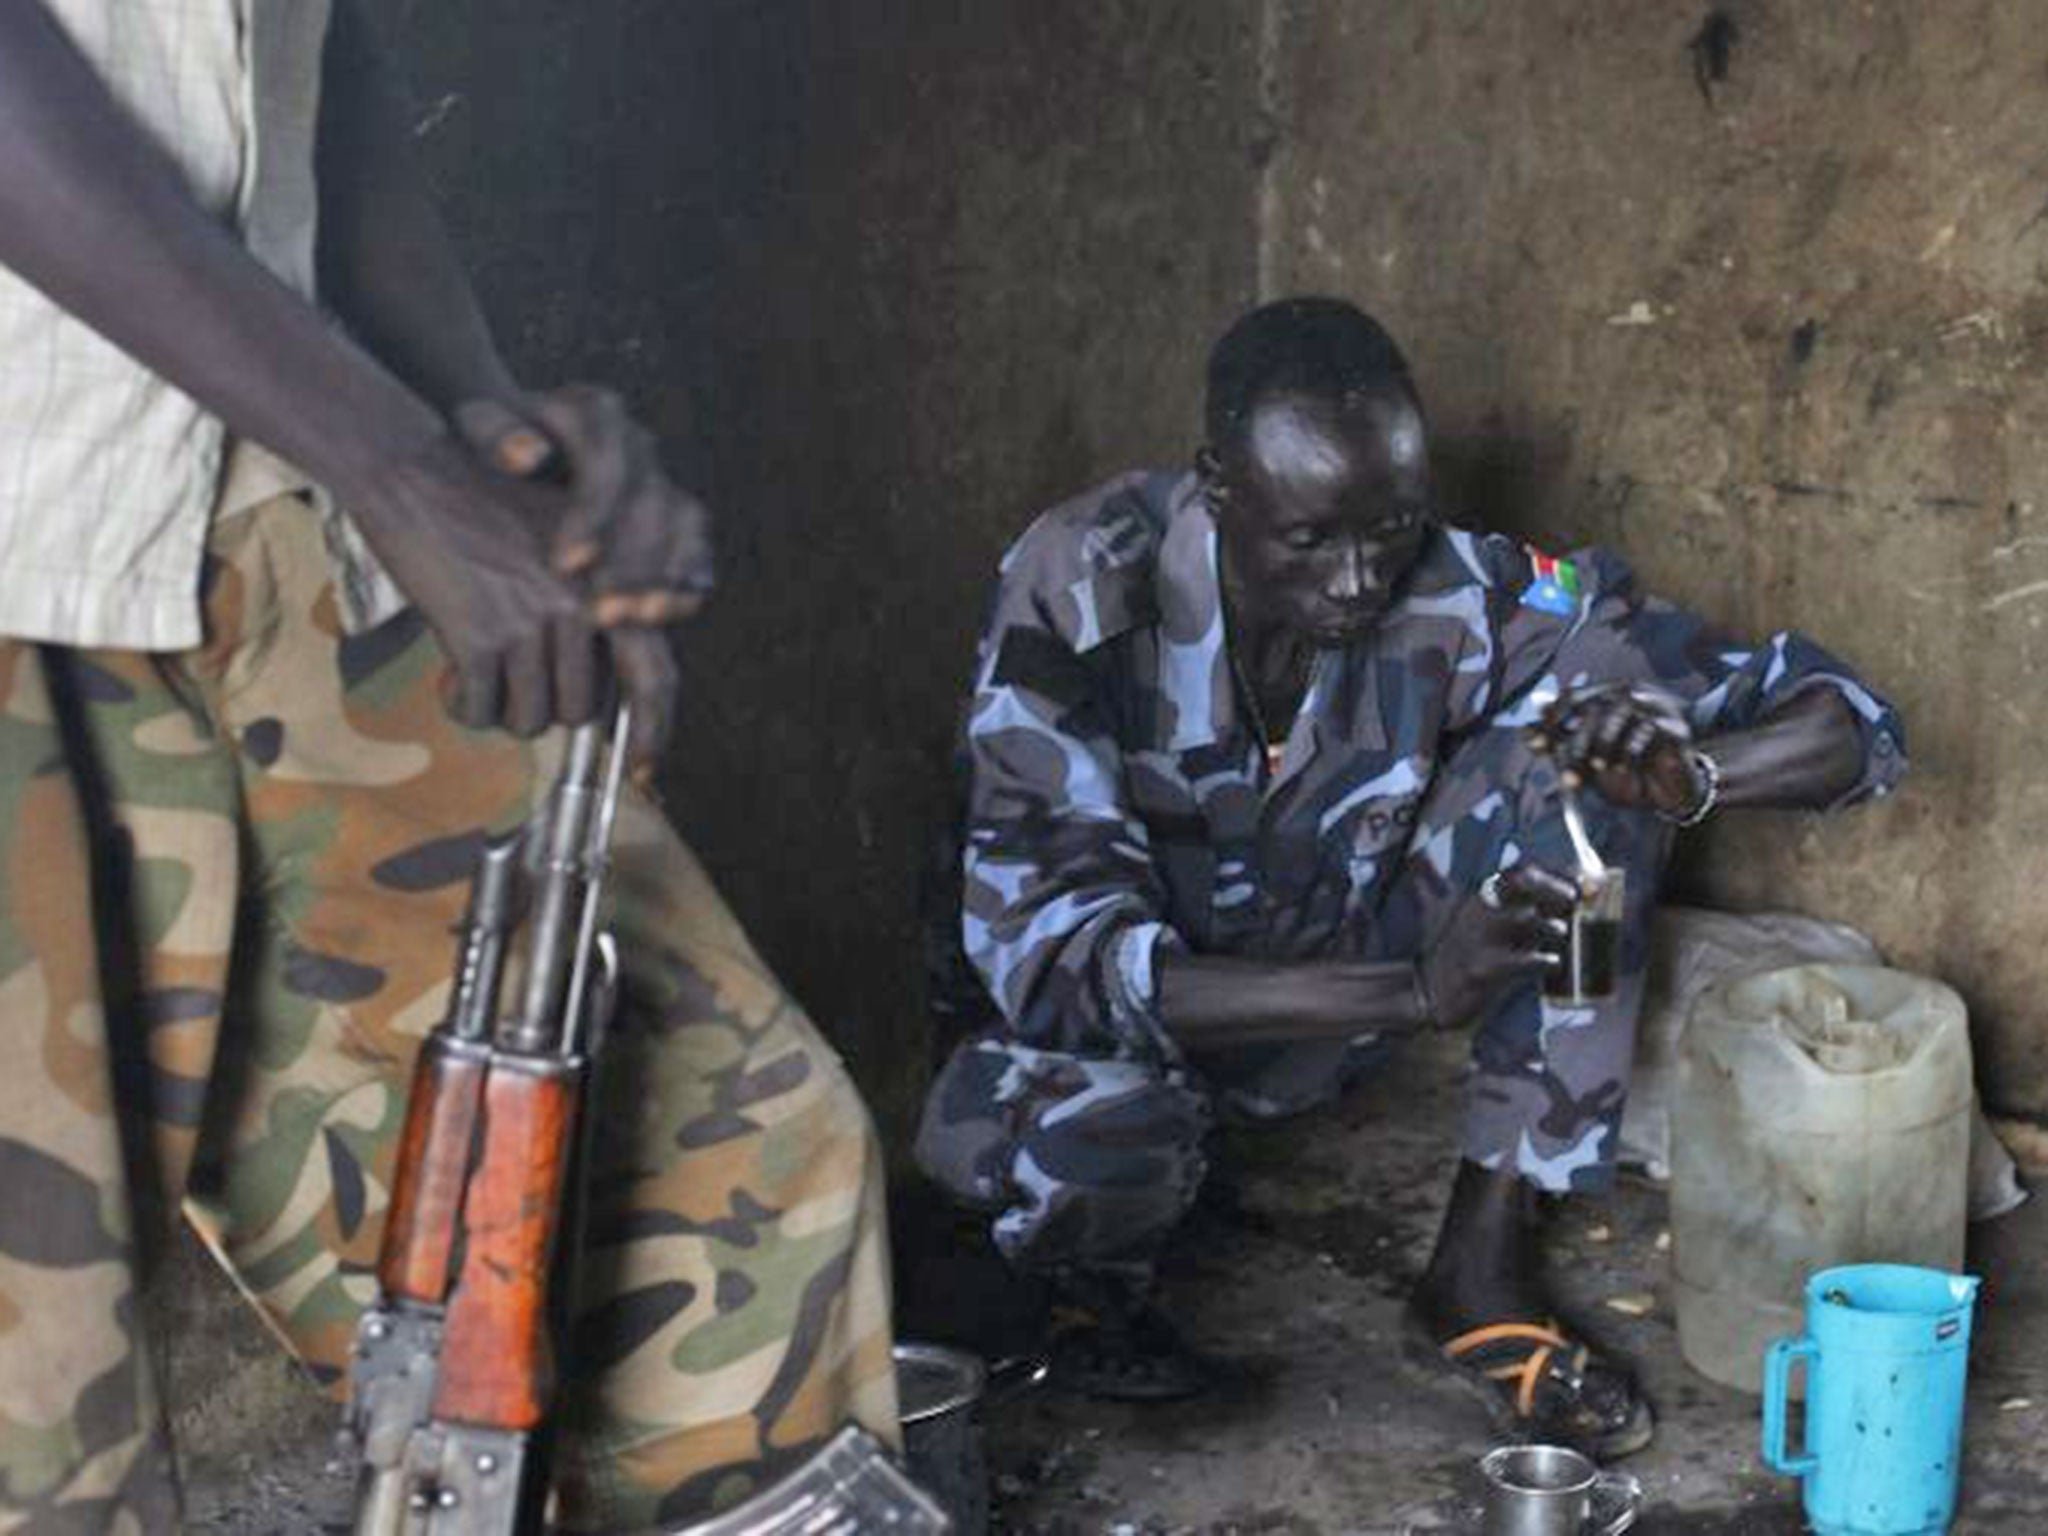 South Sudan Humanitarian Crisis The Poor Media Coverage Highlights